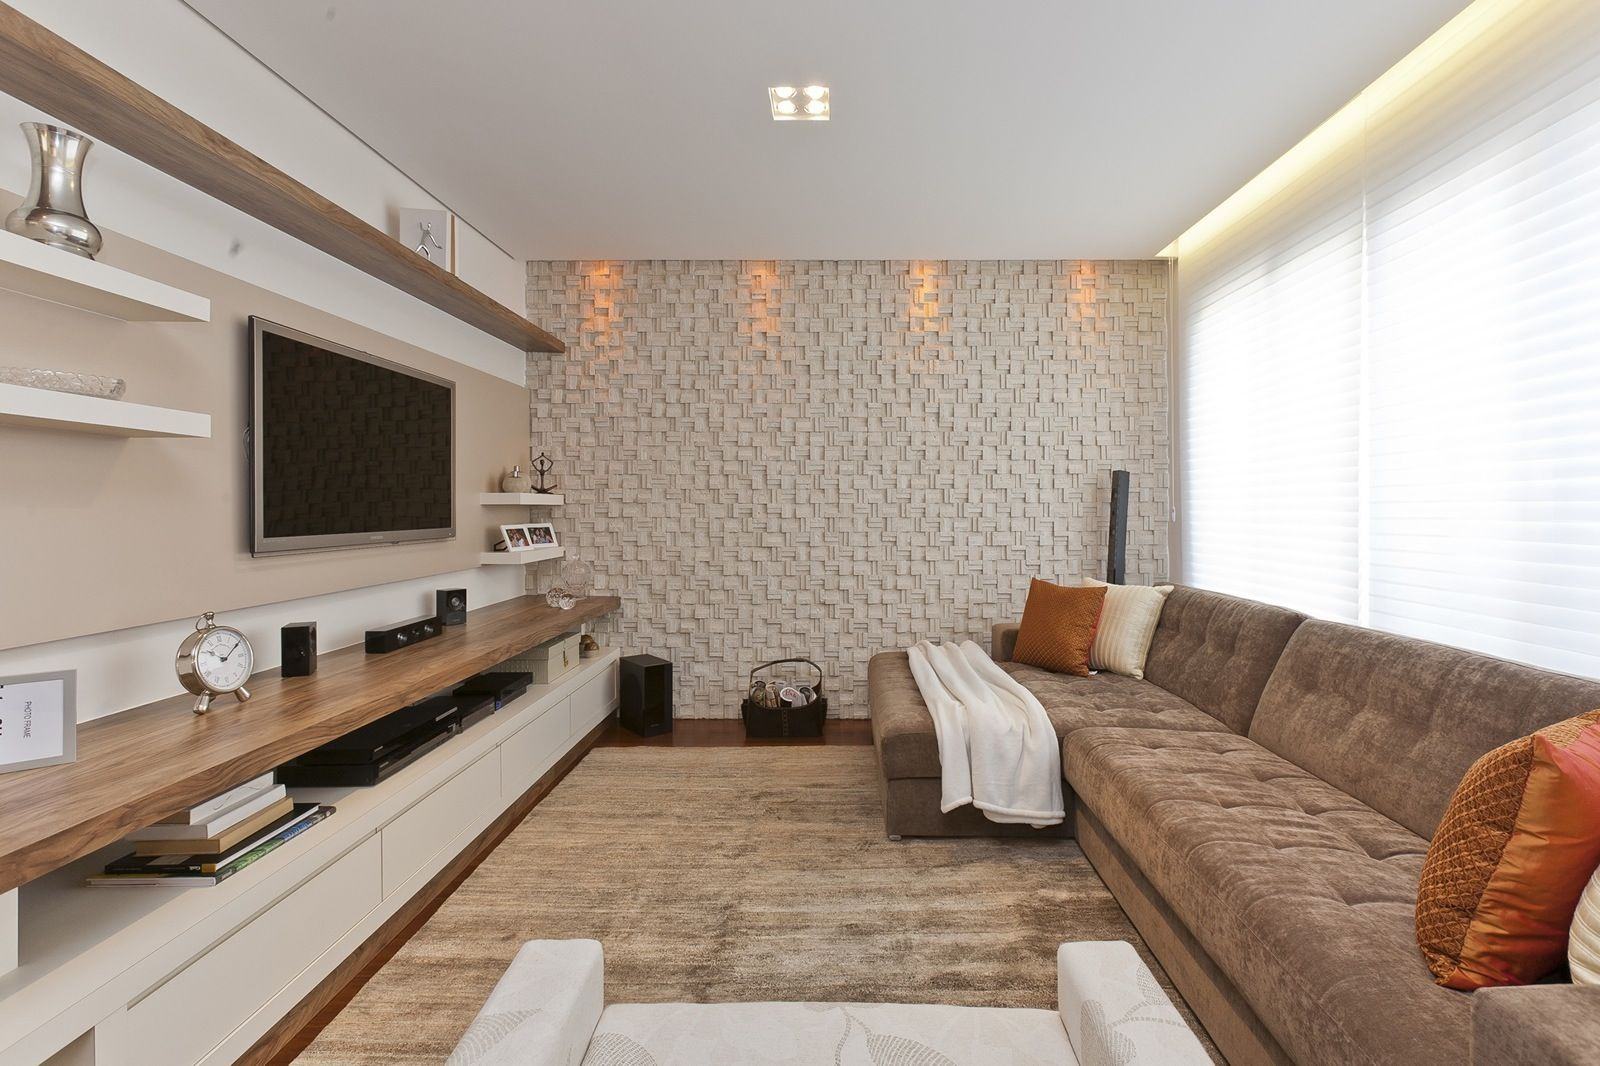 Sala De Estar Medidas De La Cocina Pinterest Sala De Estar  -> Medidas De Una Sala De Tv